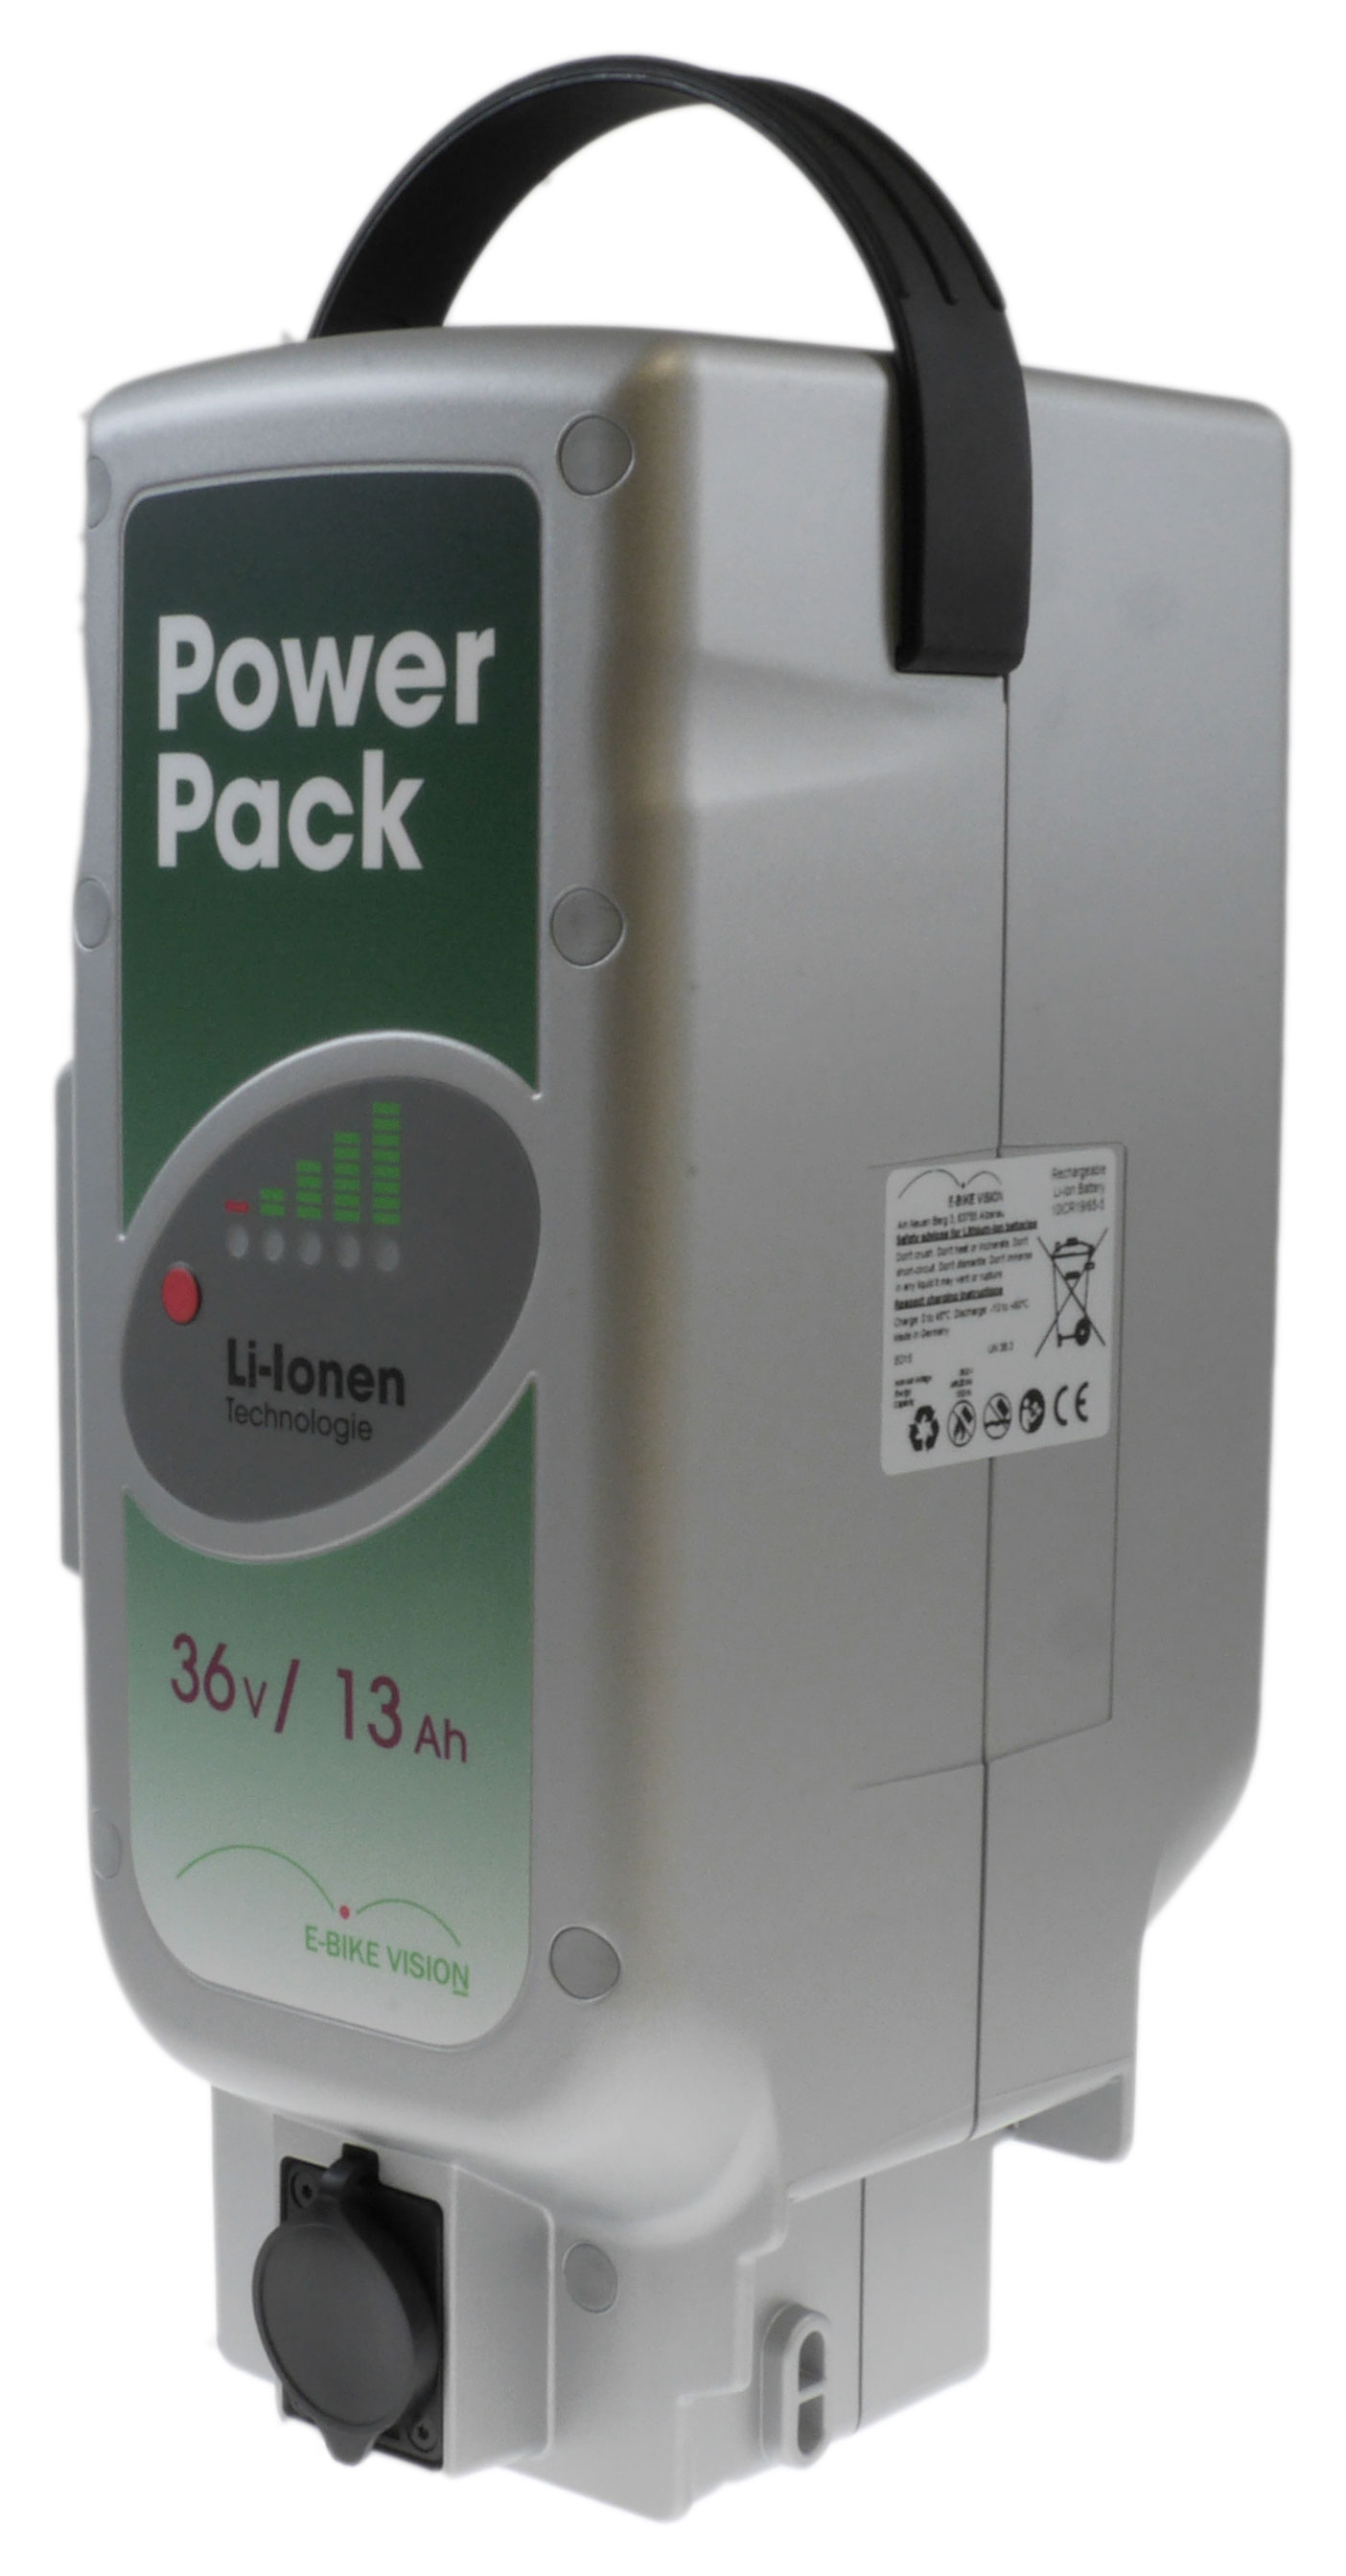 Ersatzakku Power Pack Li-Ion 36V / 13Ah E-Bike mit Panasonic Antrieb Bild 2